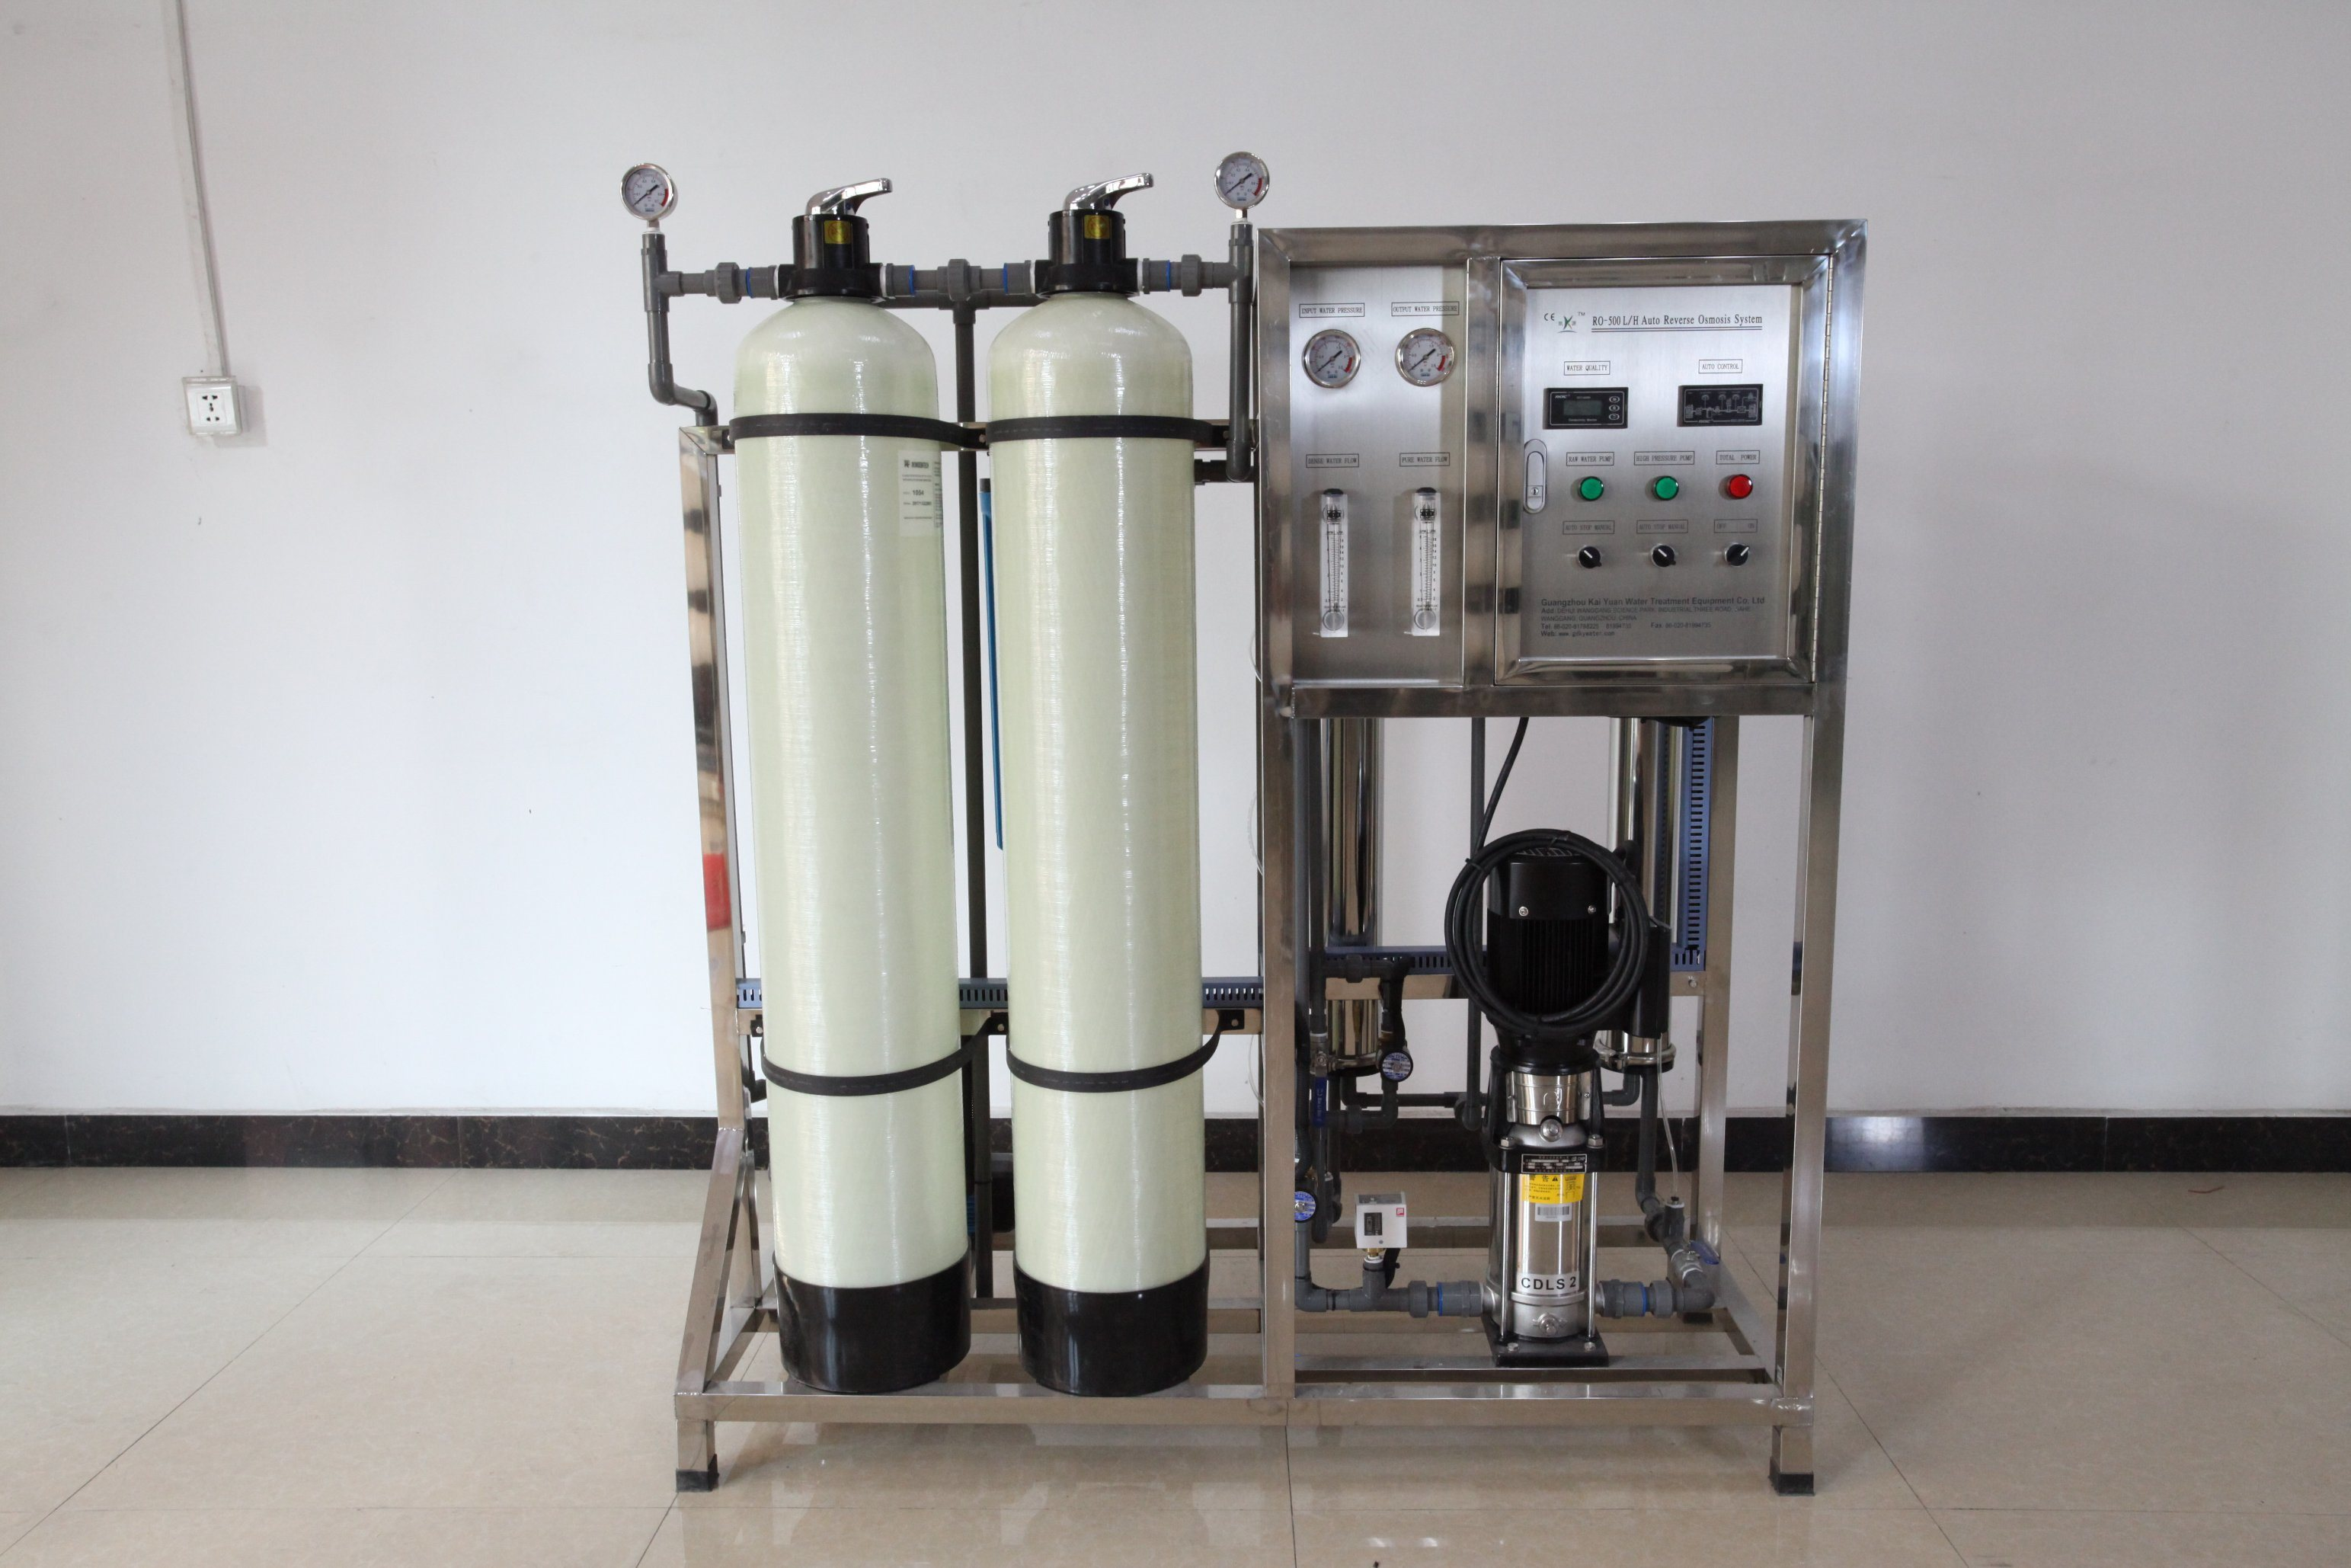 05728869c3c China Reverse Osmosis Water Purification System 500lph - China ...